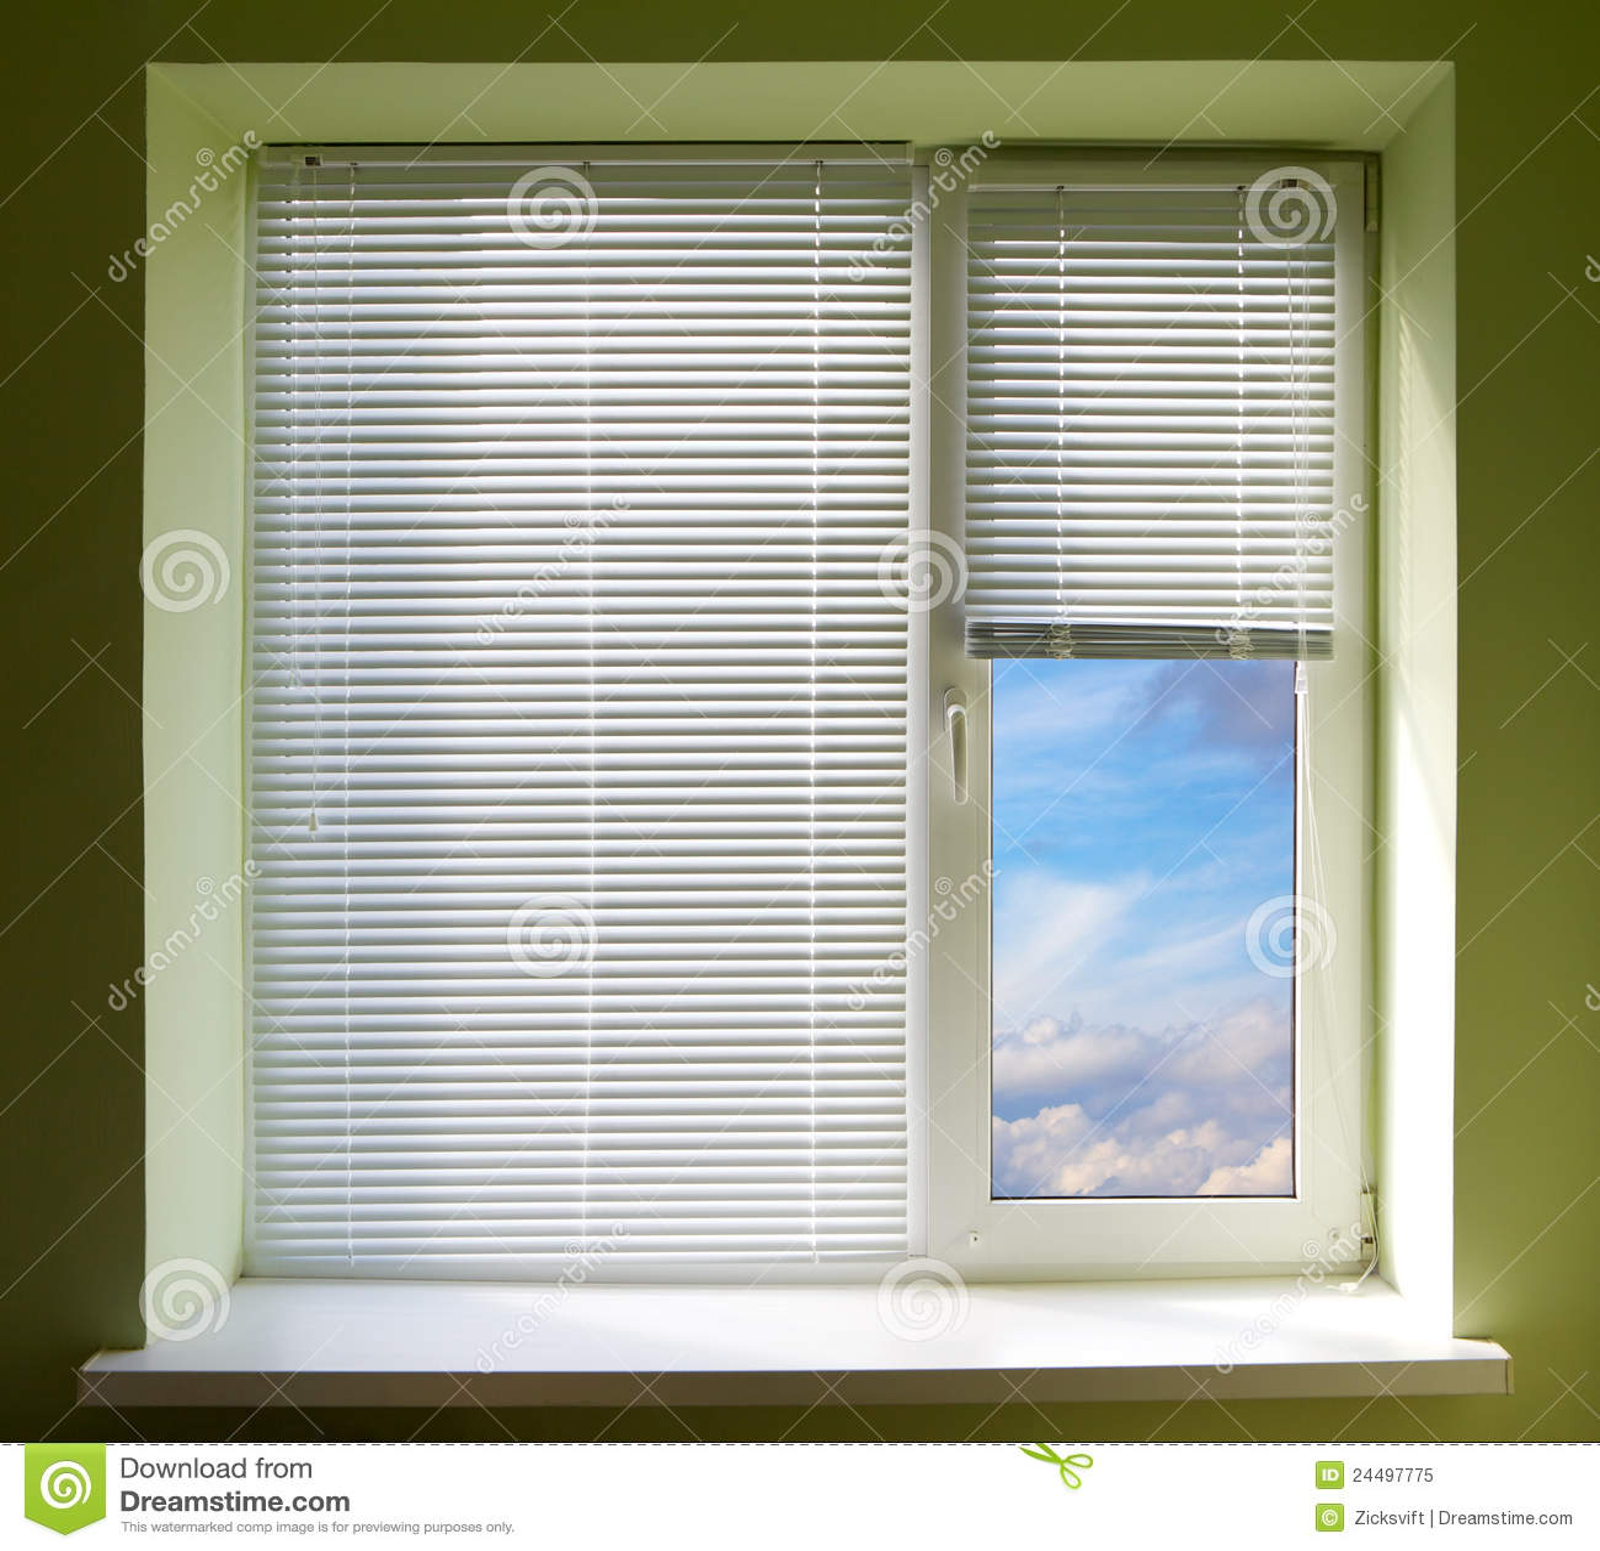 plastic window blinds pvc window blinds stock image image of blank office decoration 24497775